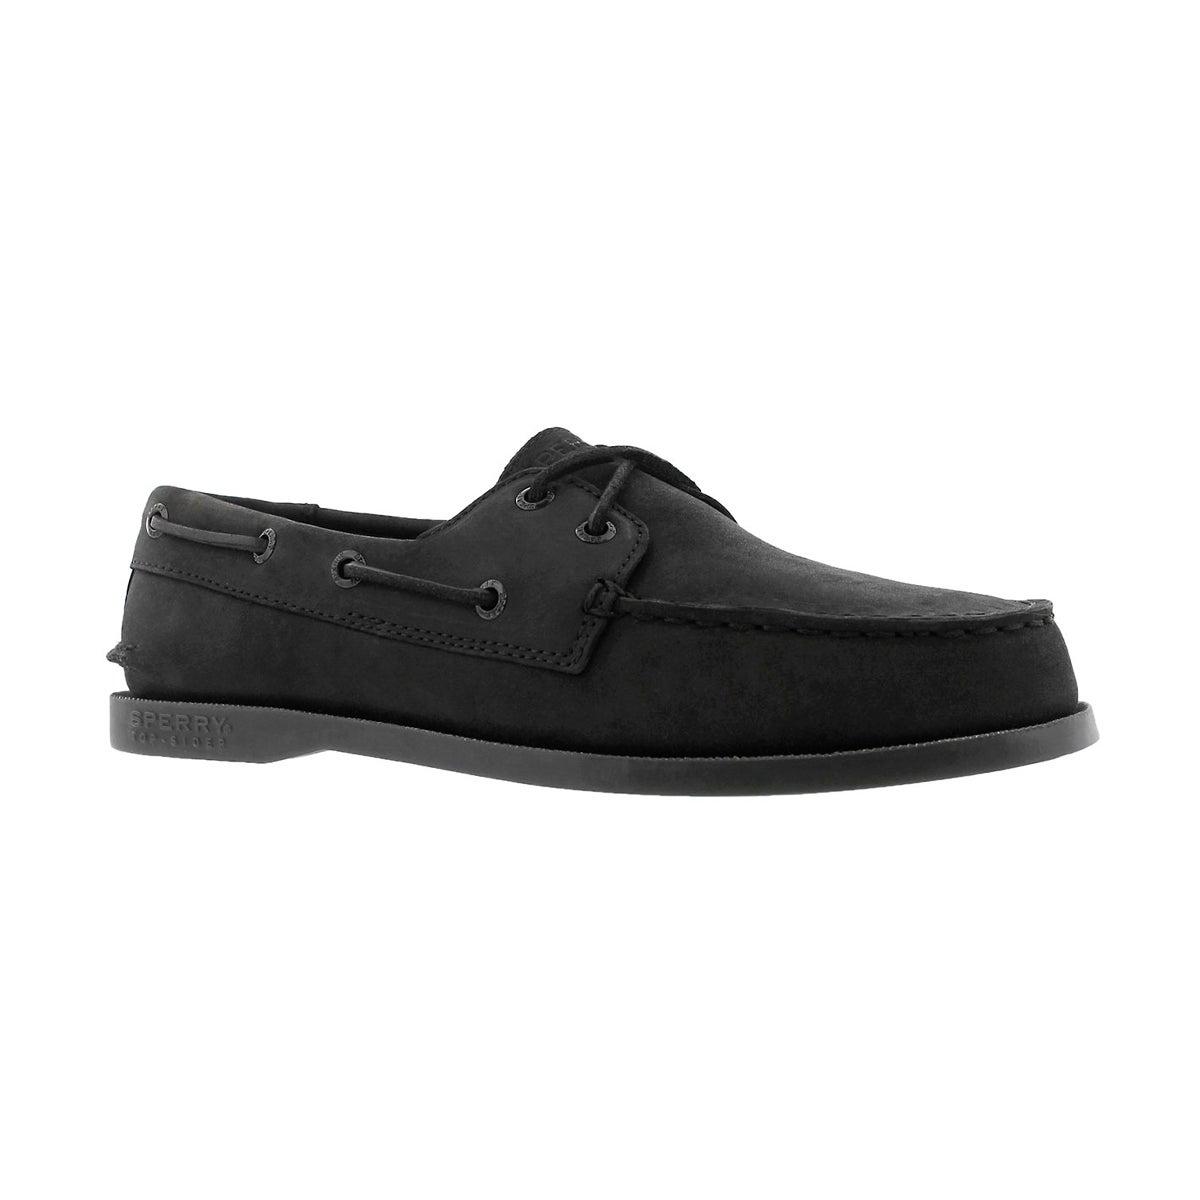 Boys' AUTHENTIC ORIGINAL black nubuck boat shoe